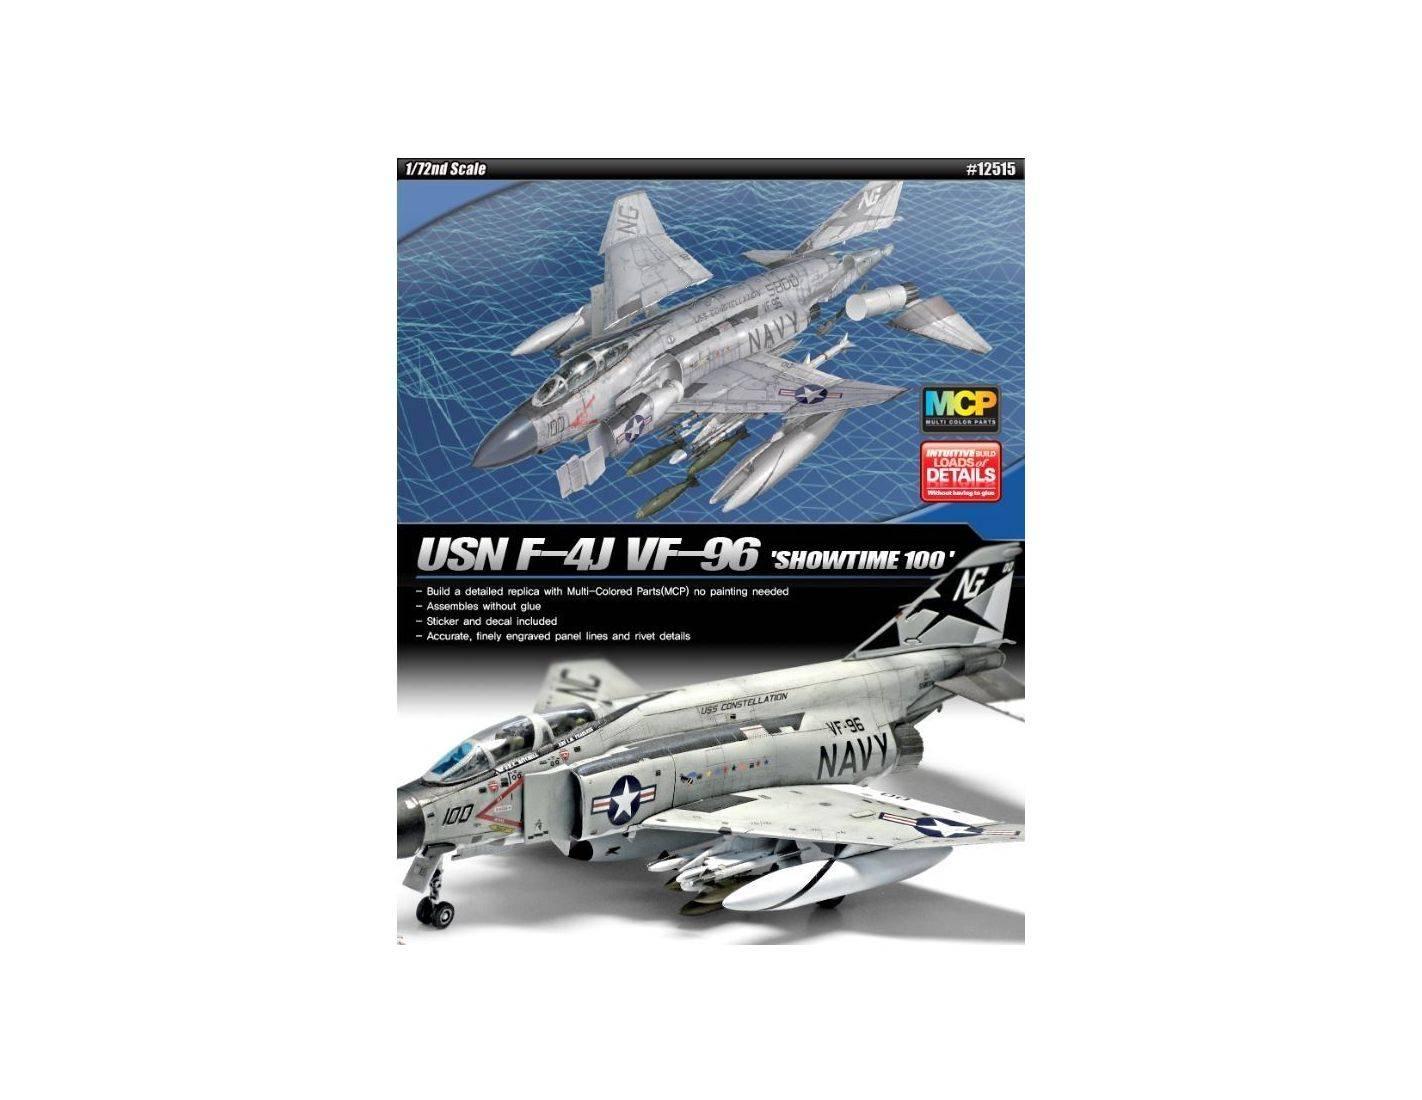 Accademy ACD12515 AEREO USN F-4J VF-96 SHOWTIME 100 KIT 1:72 Modellino